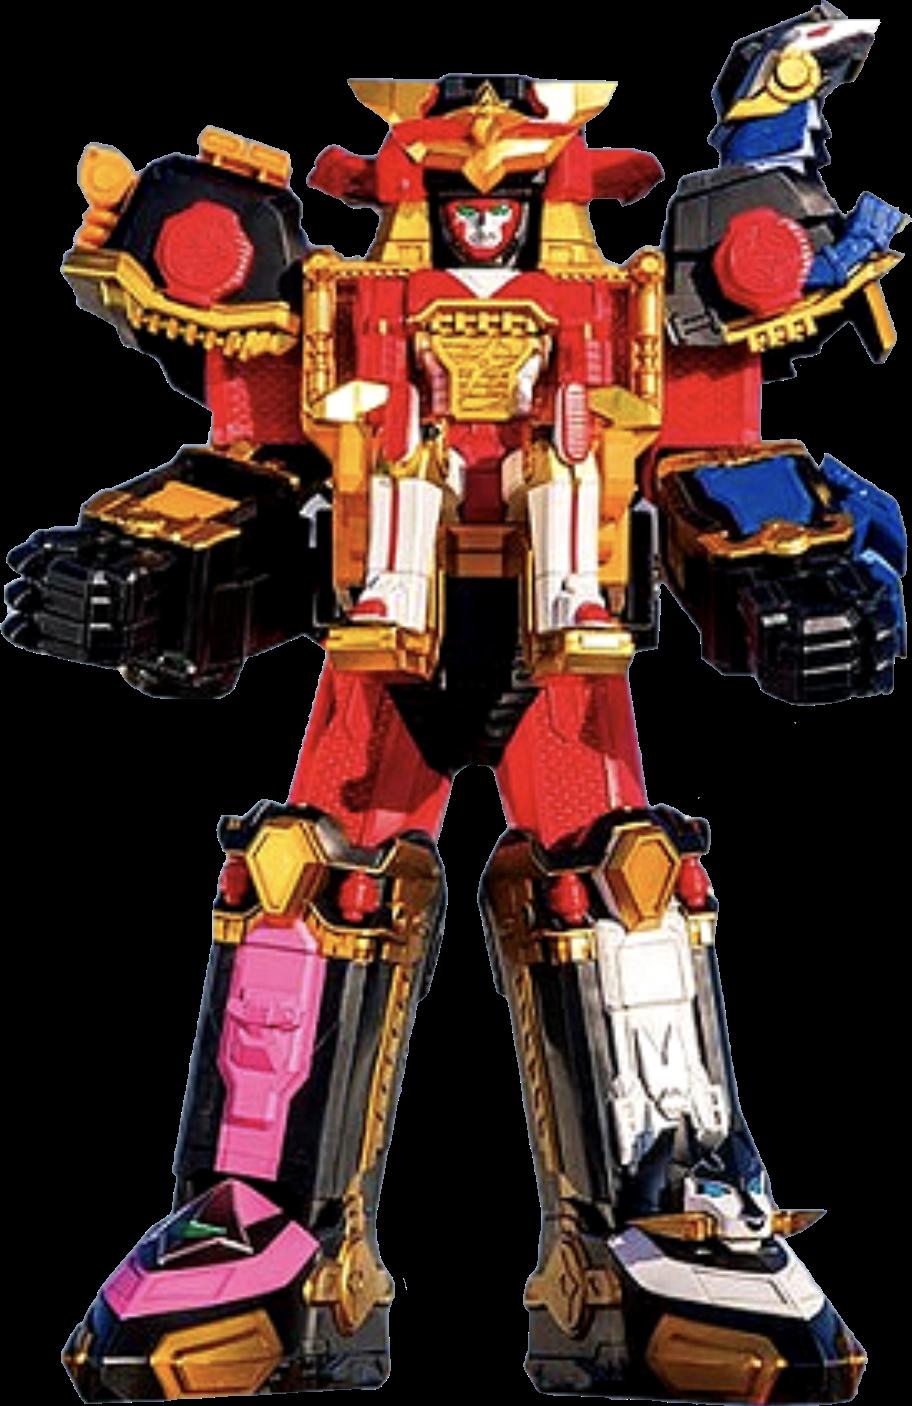 Ninja Steel Megazord | RangerWiki | FANDOM powered by Wikia